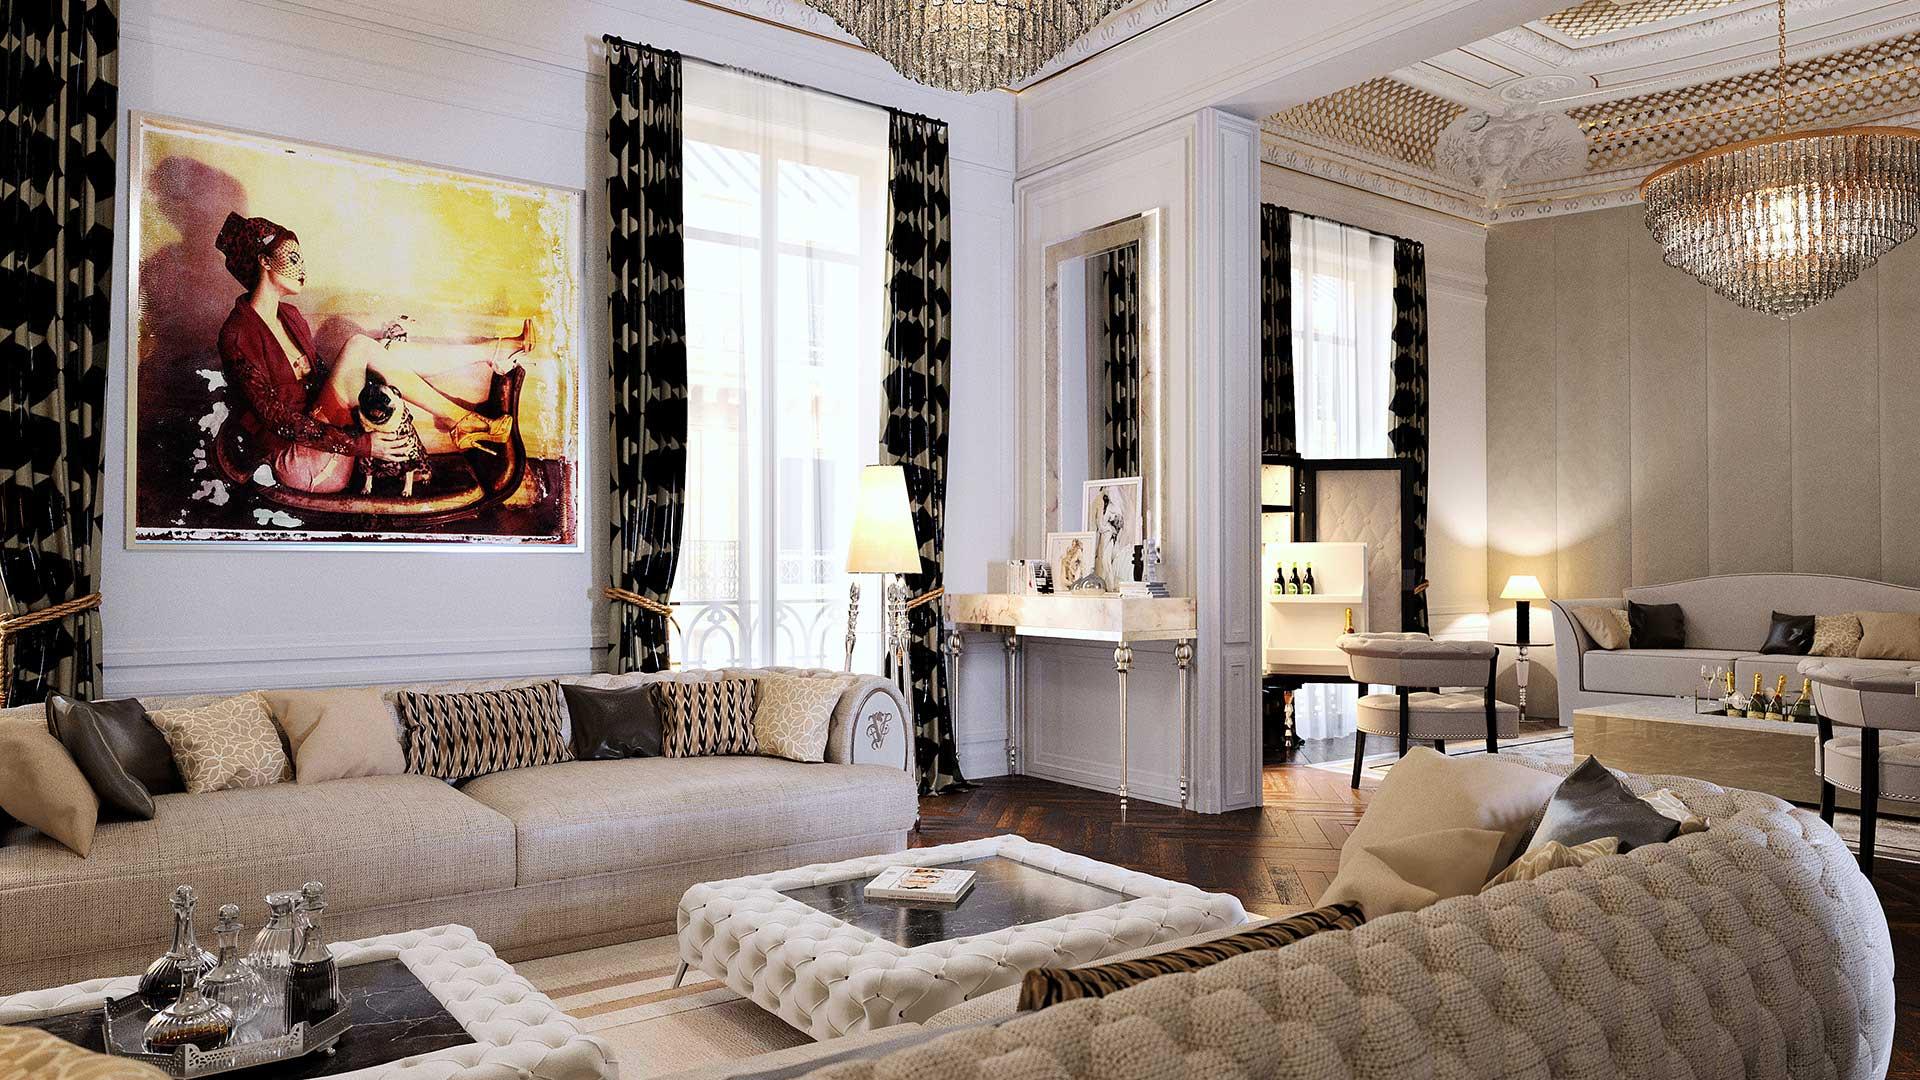 agency 3d lyon 3d creative studio luxurious living room haussmann. Black Bedroom Furniture Sets. Home Design Ideas